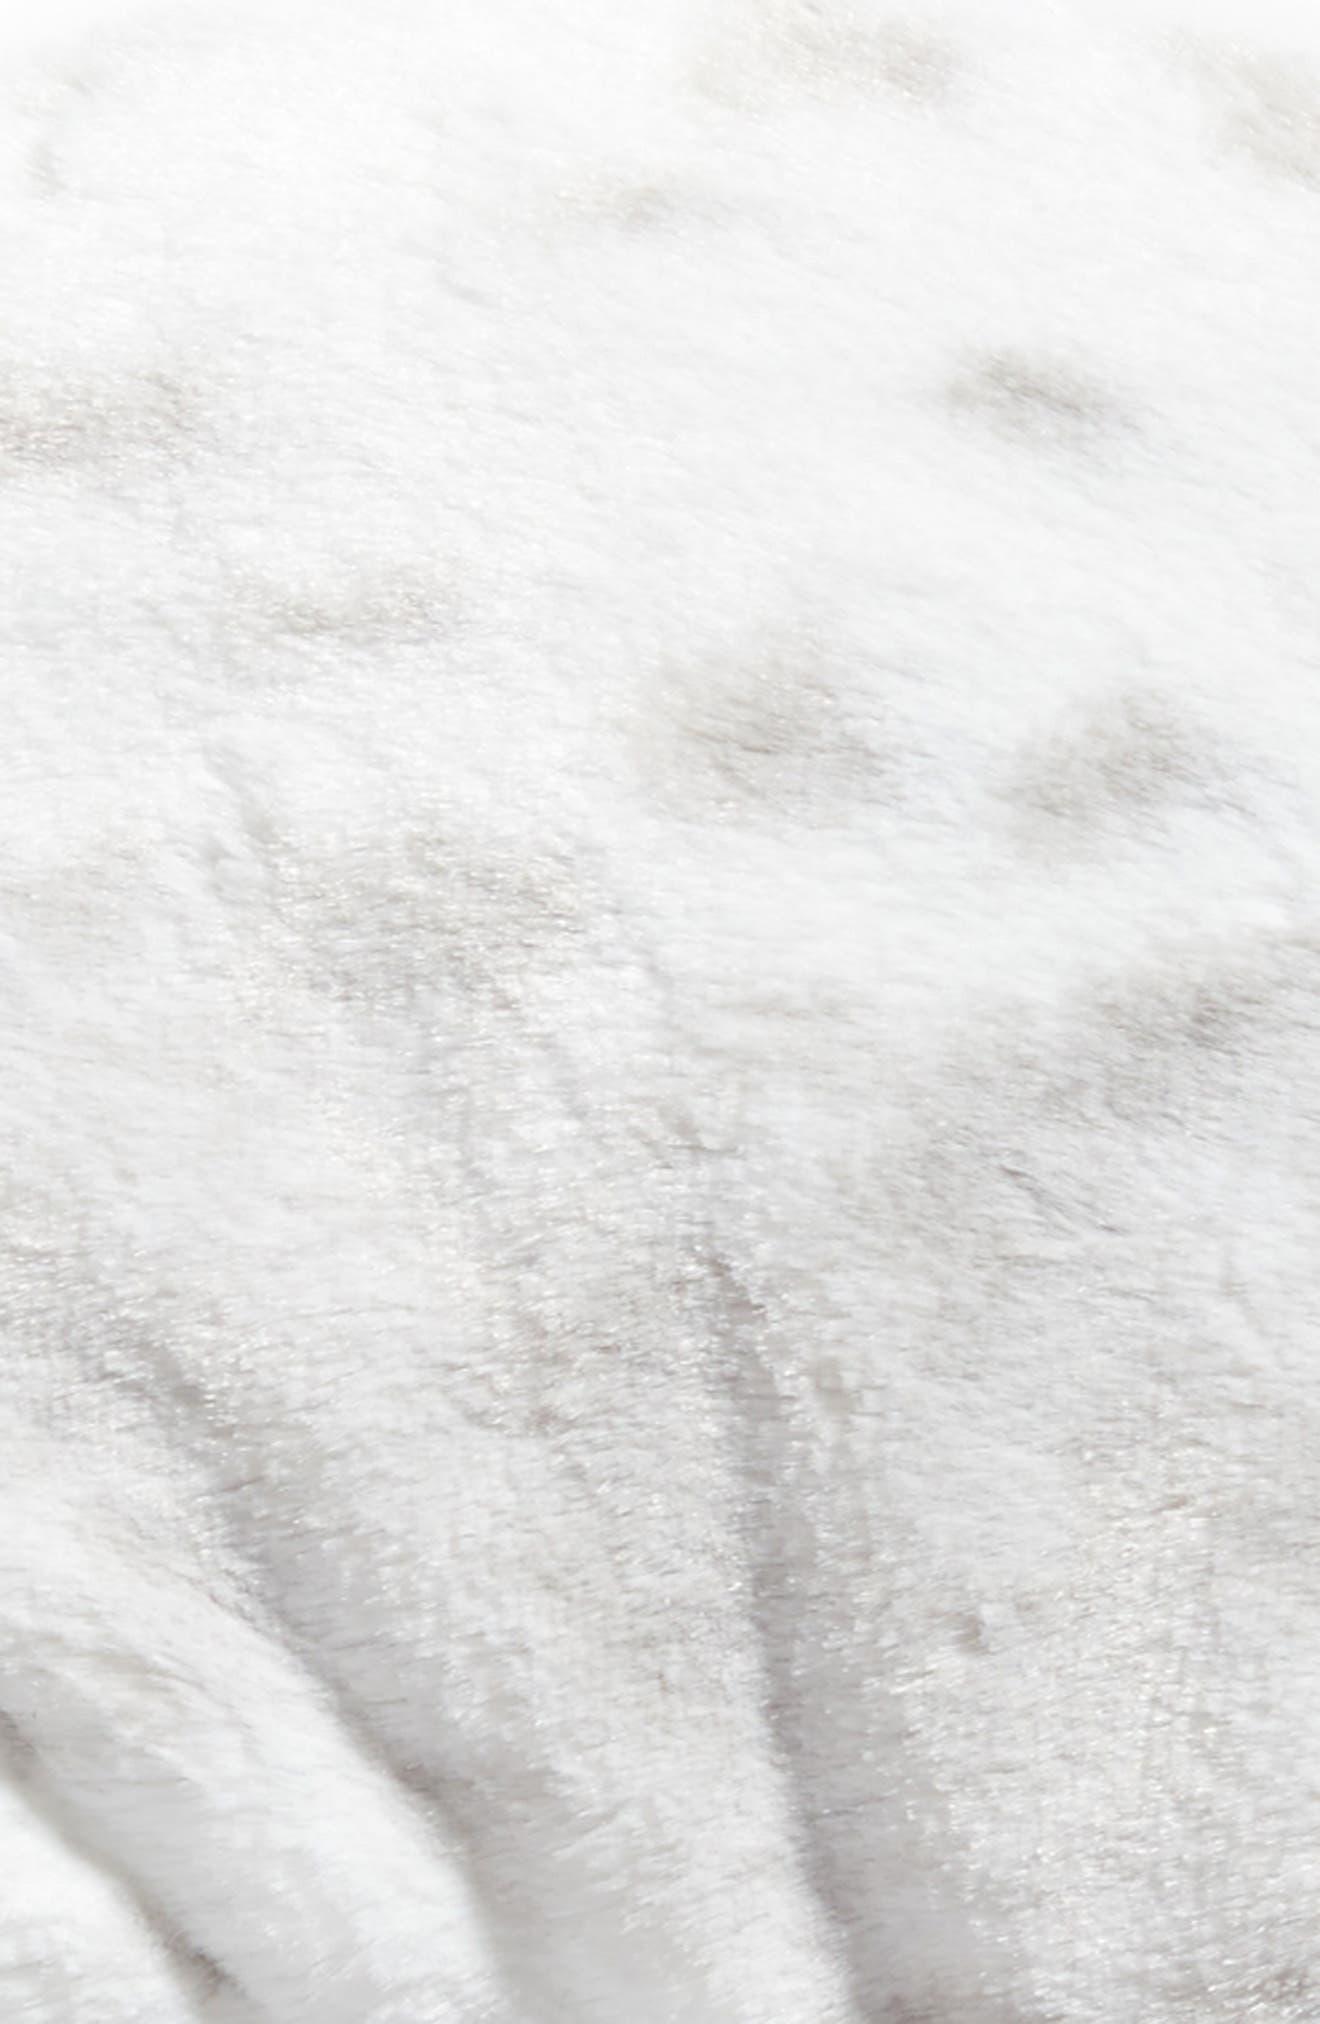 Siberian Leopard Neck Pillow,                             Alternate thumbnail 2, color,                             000